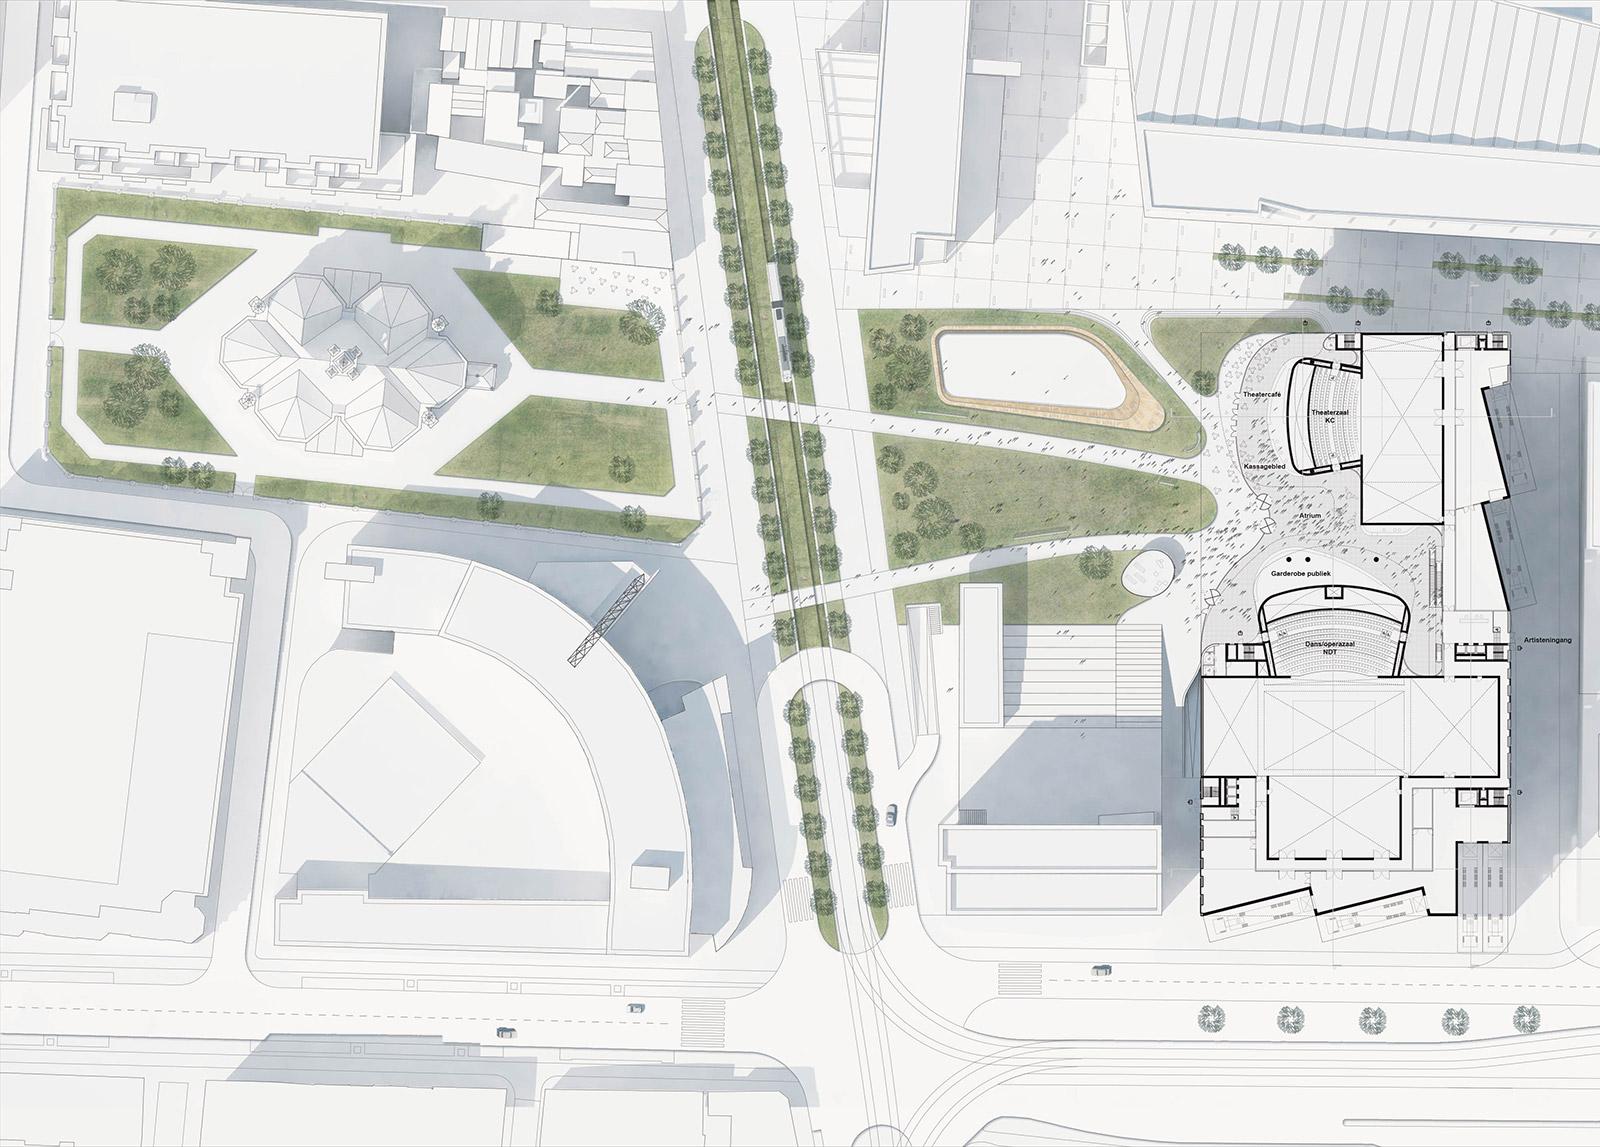 DMC The Hague - Map